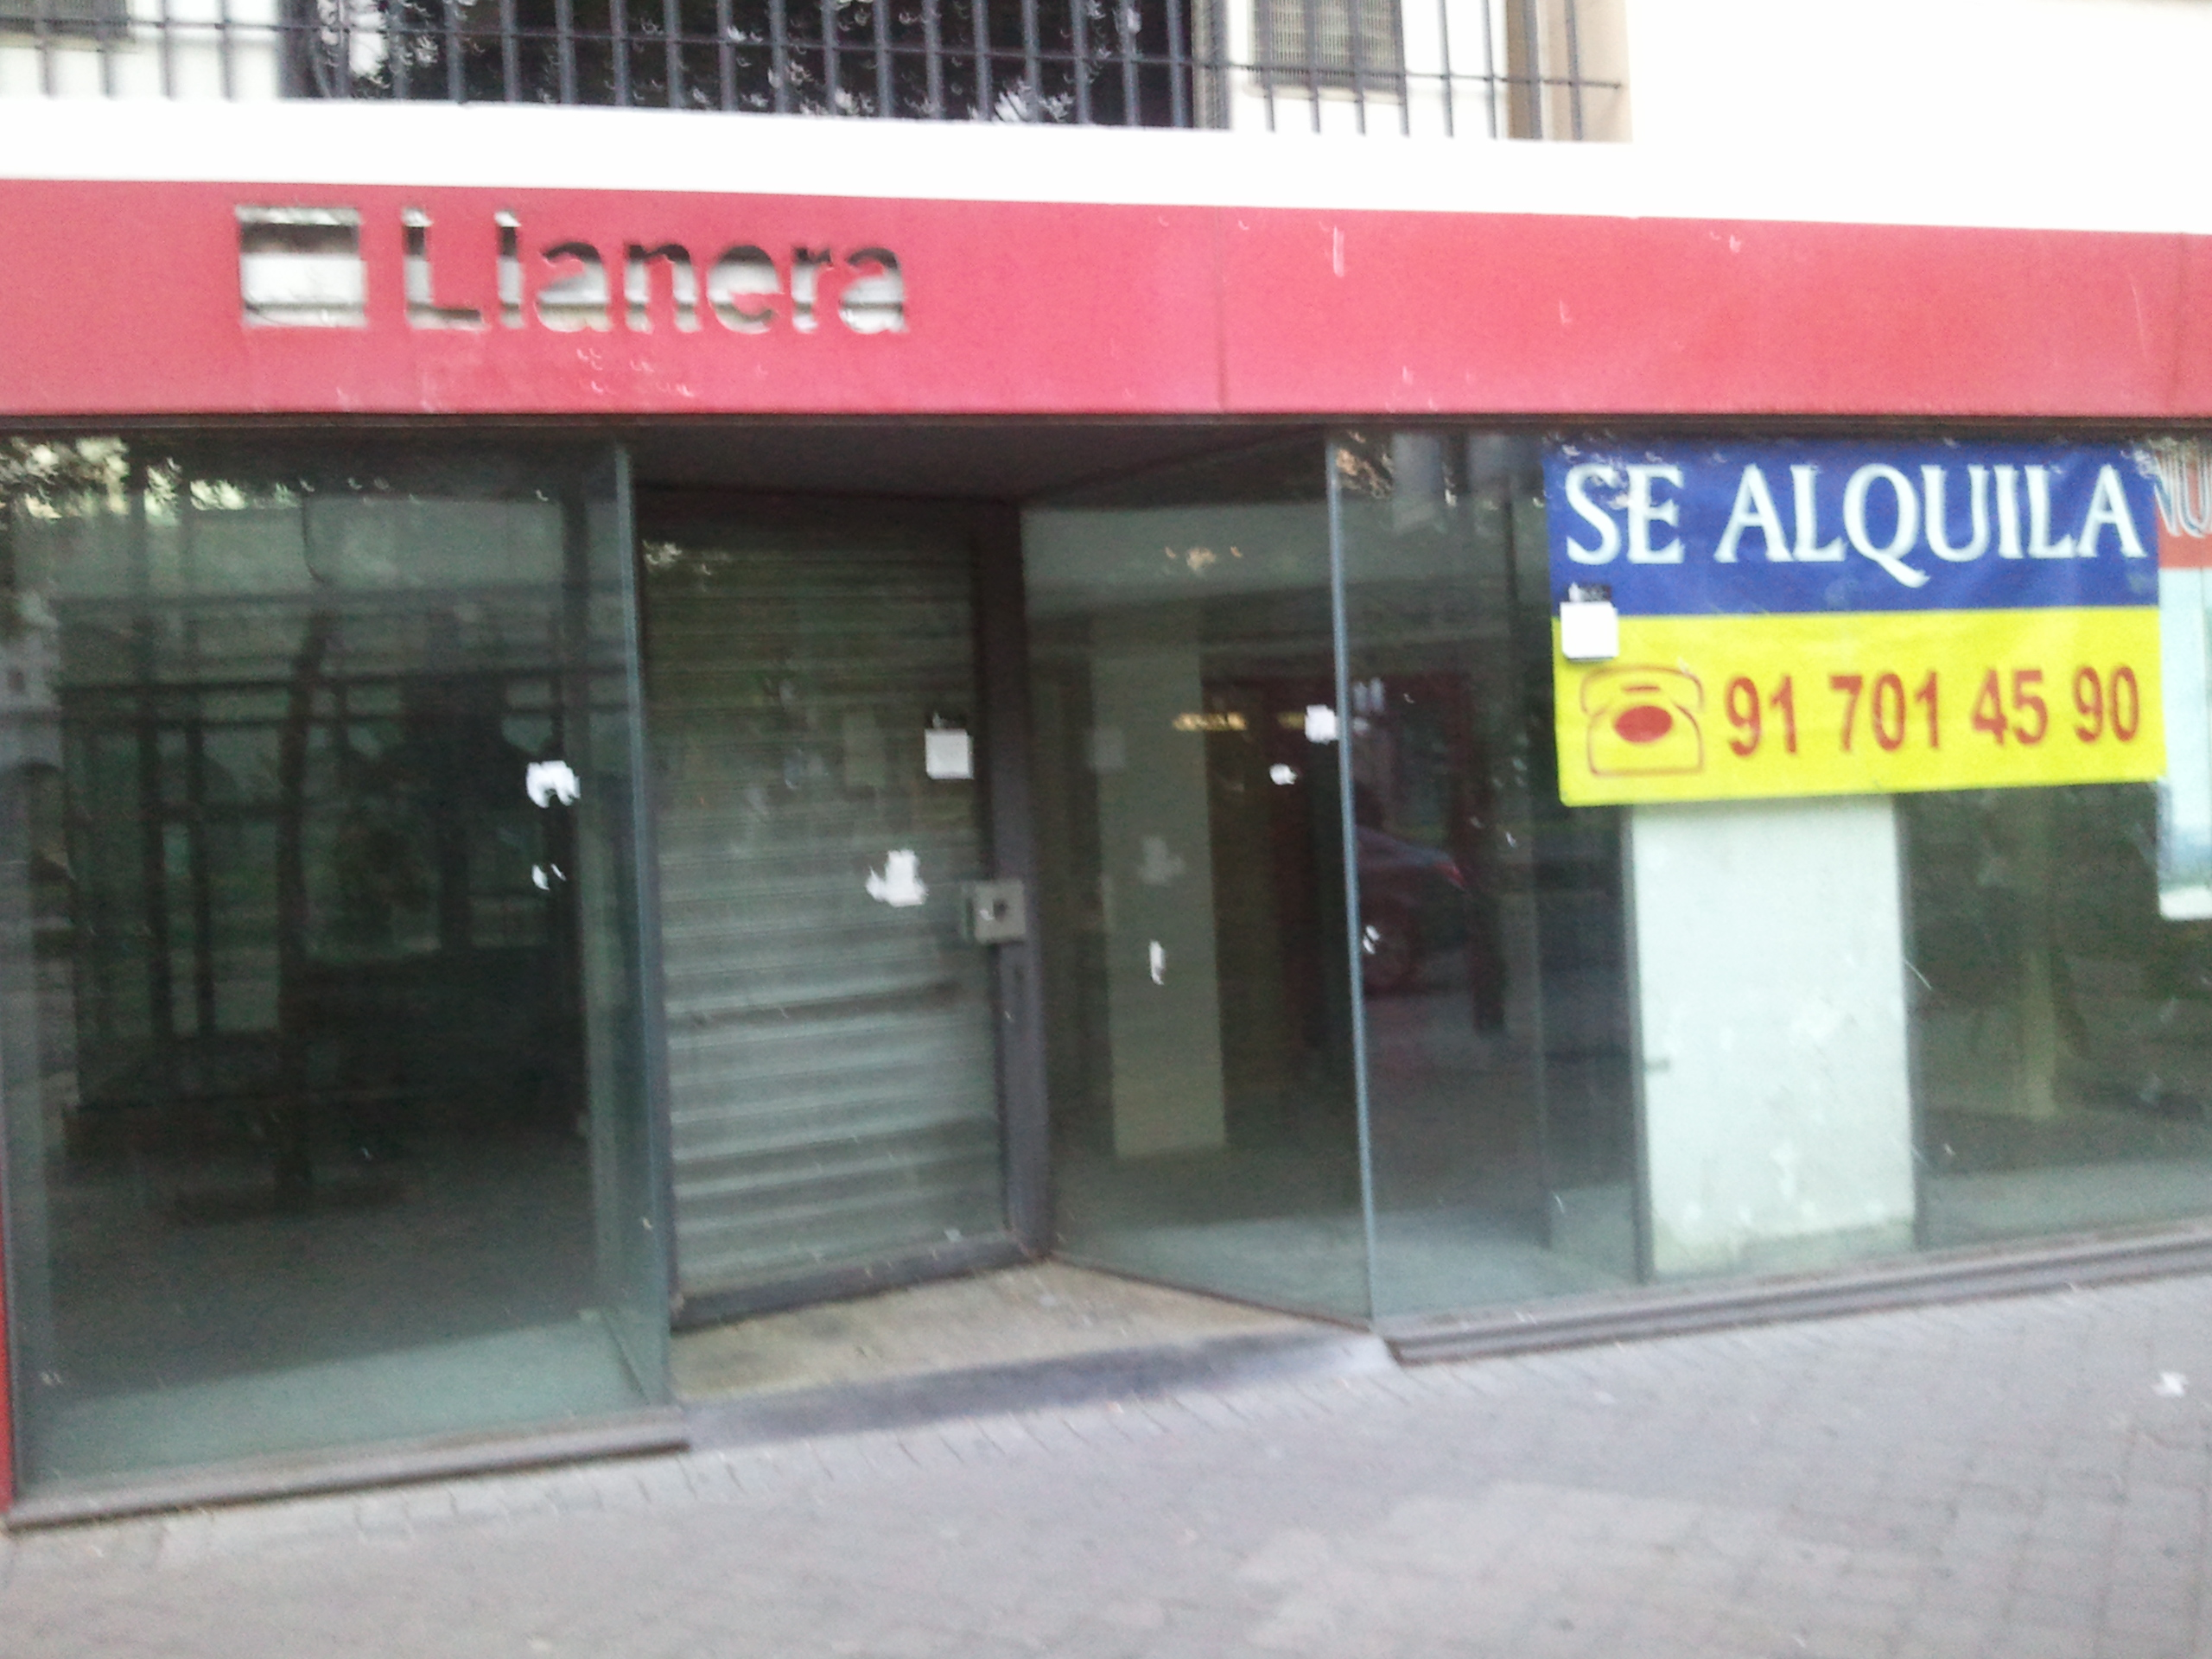 negocio cerrado crisis, por Pilar Blázquez